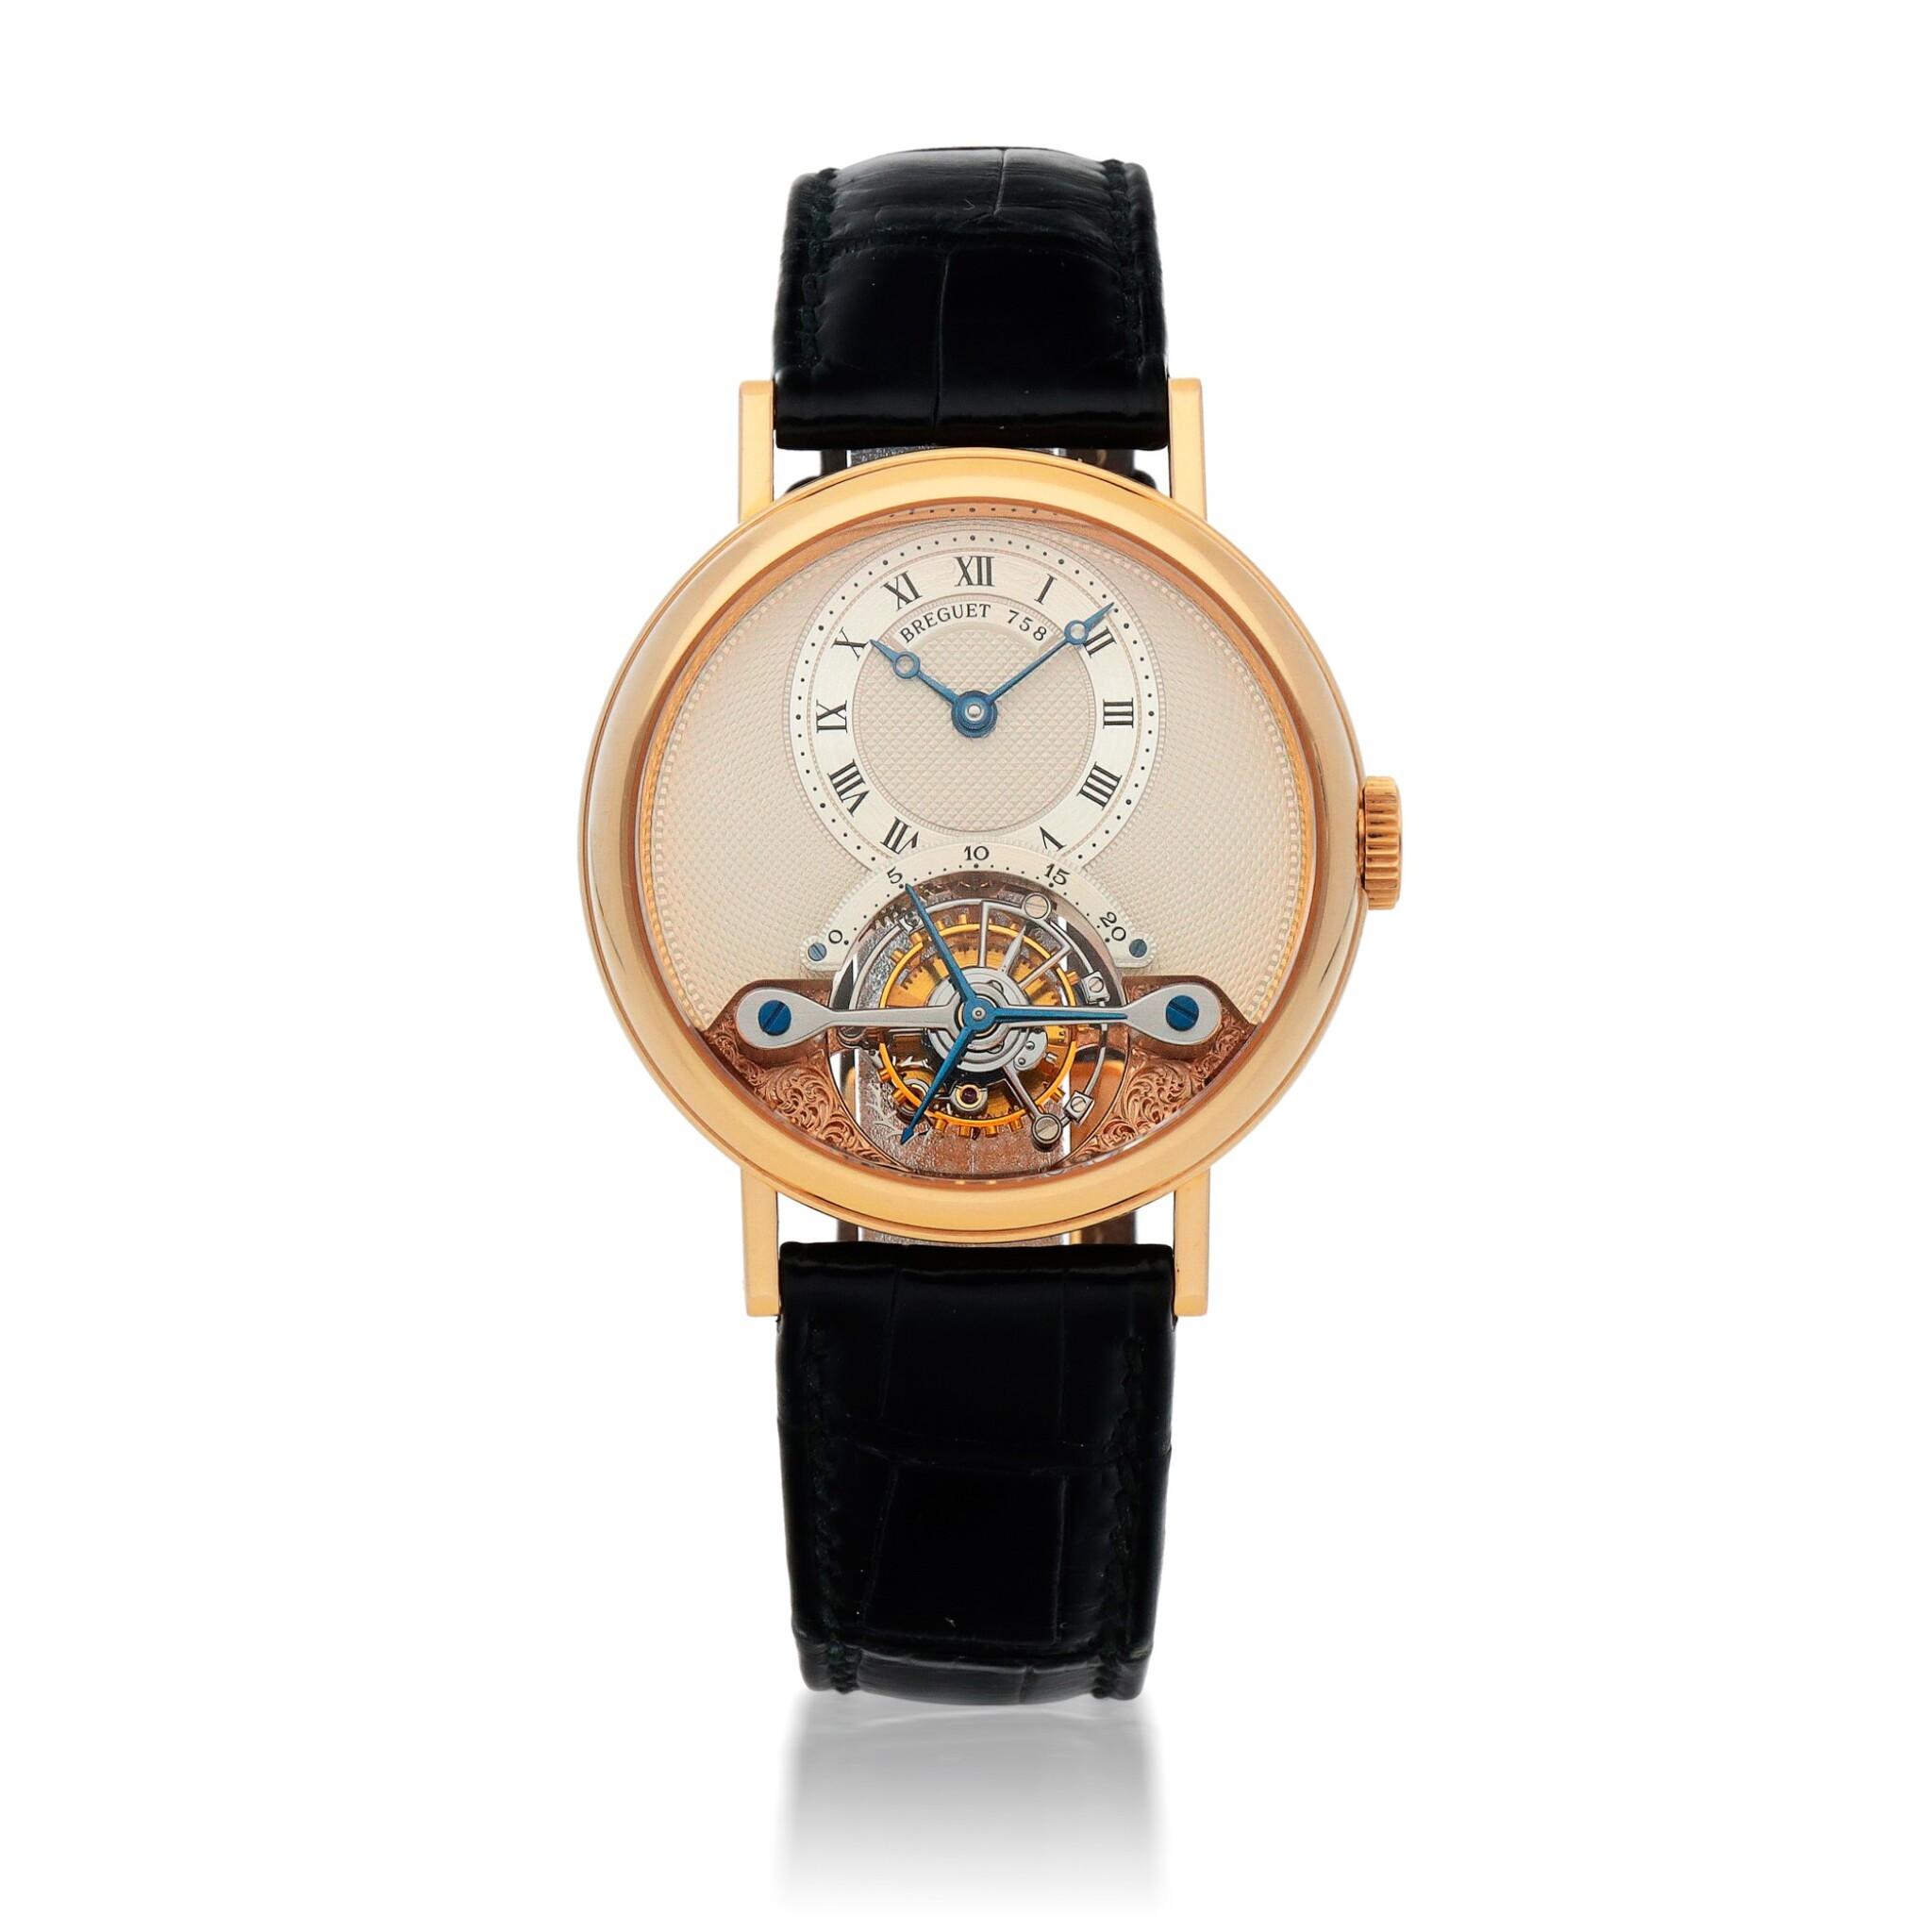 View full screen - View 1 of Lot 444. Classique, Ref. 3350BR/12/286 Pink gold tourbillon wristwatch Made in 1996 | 寶璣 3350BR/12/286型號「Classique」粉紅金陀飛輪腕錶,1996年製.